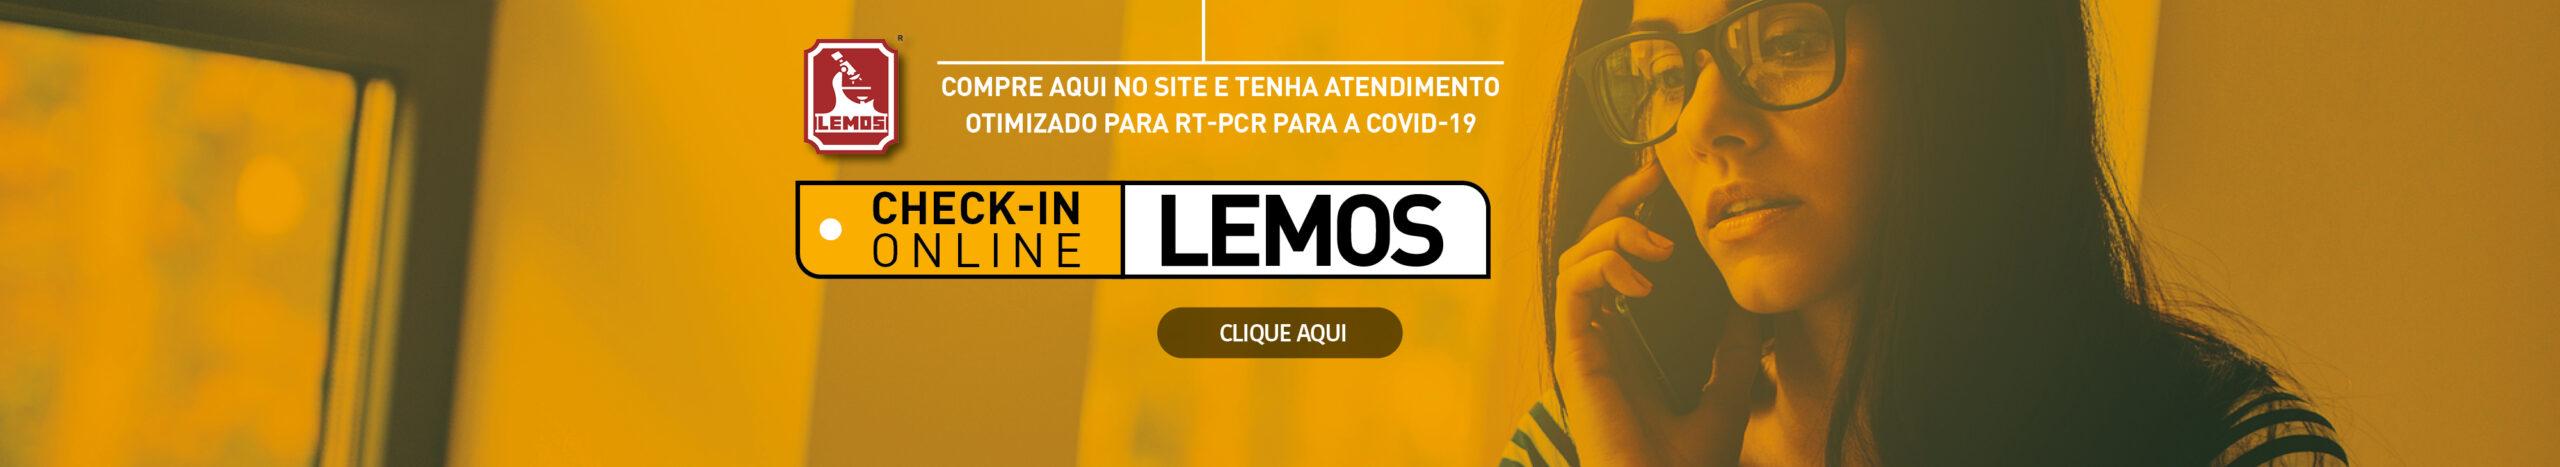 Check-In Lemos